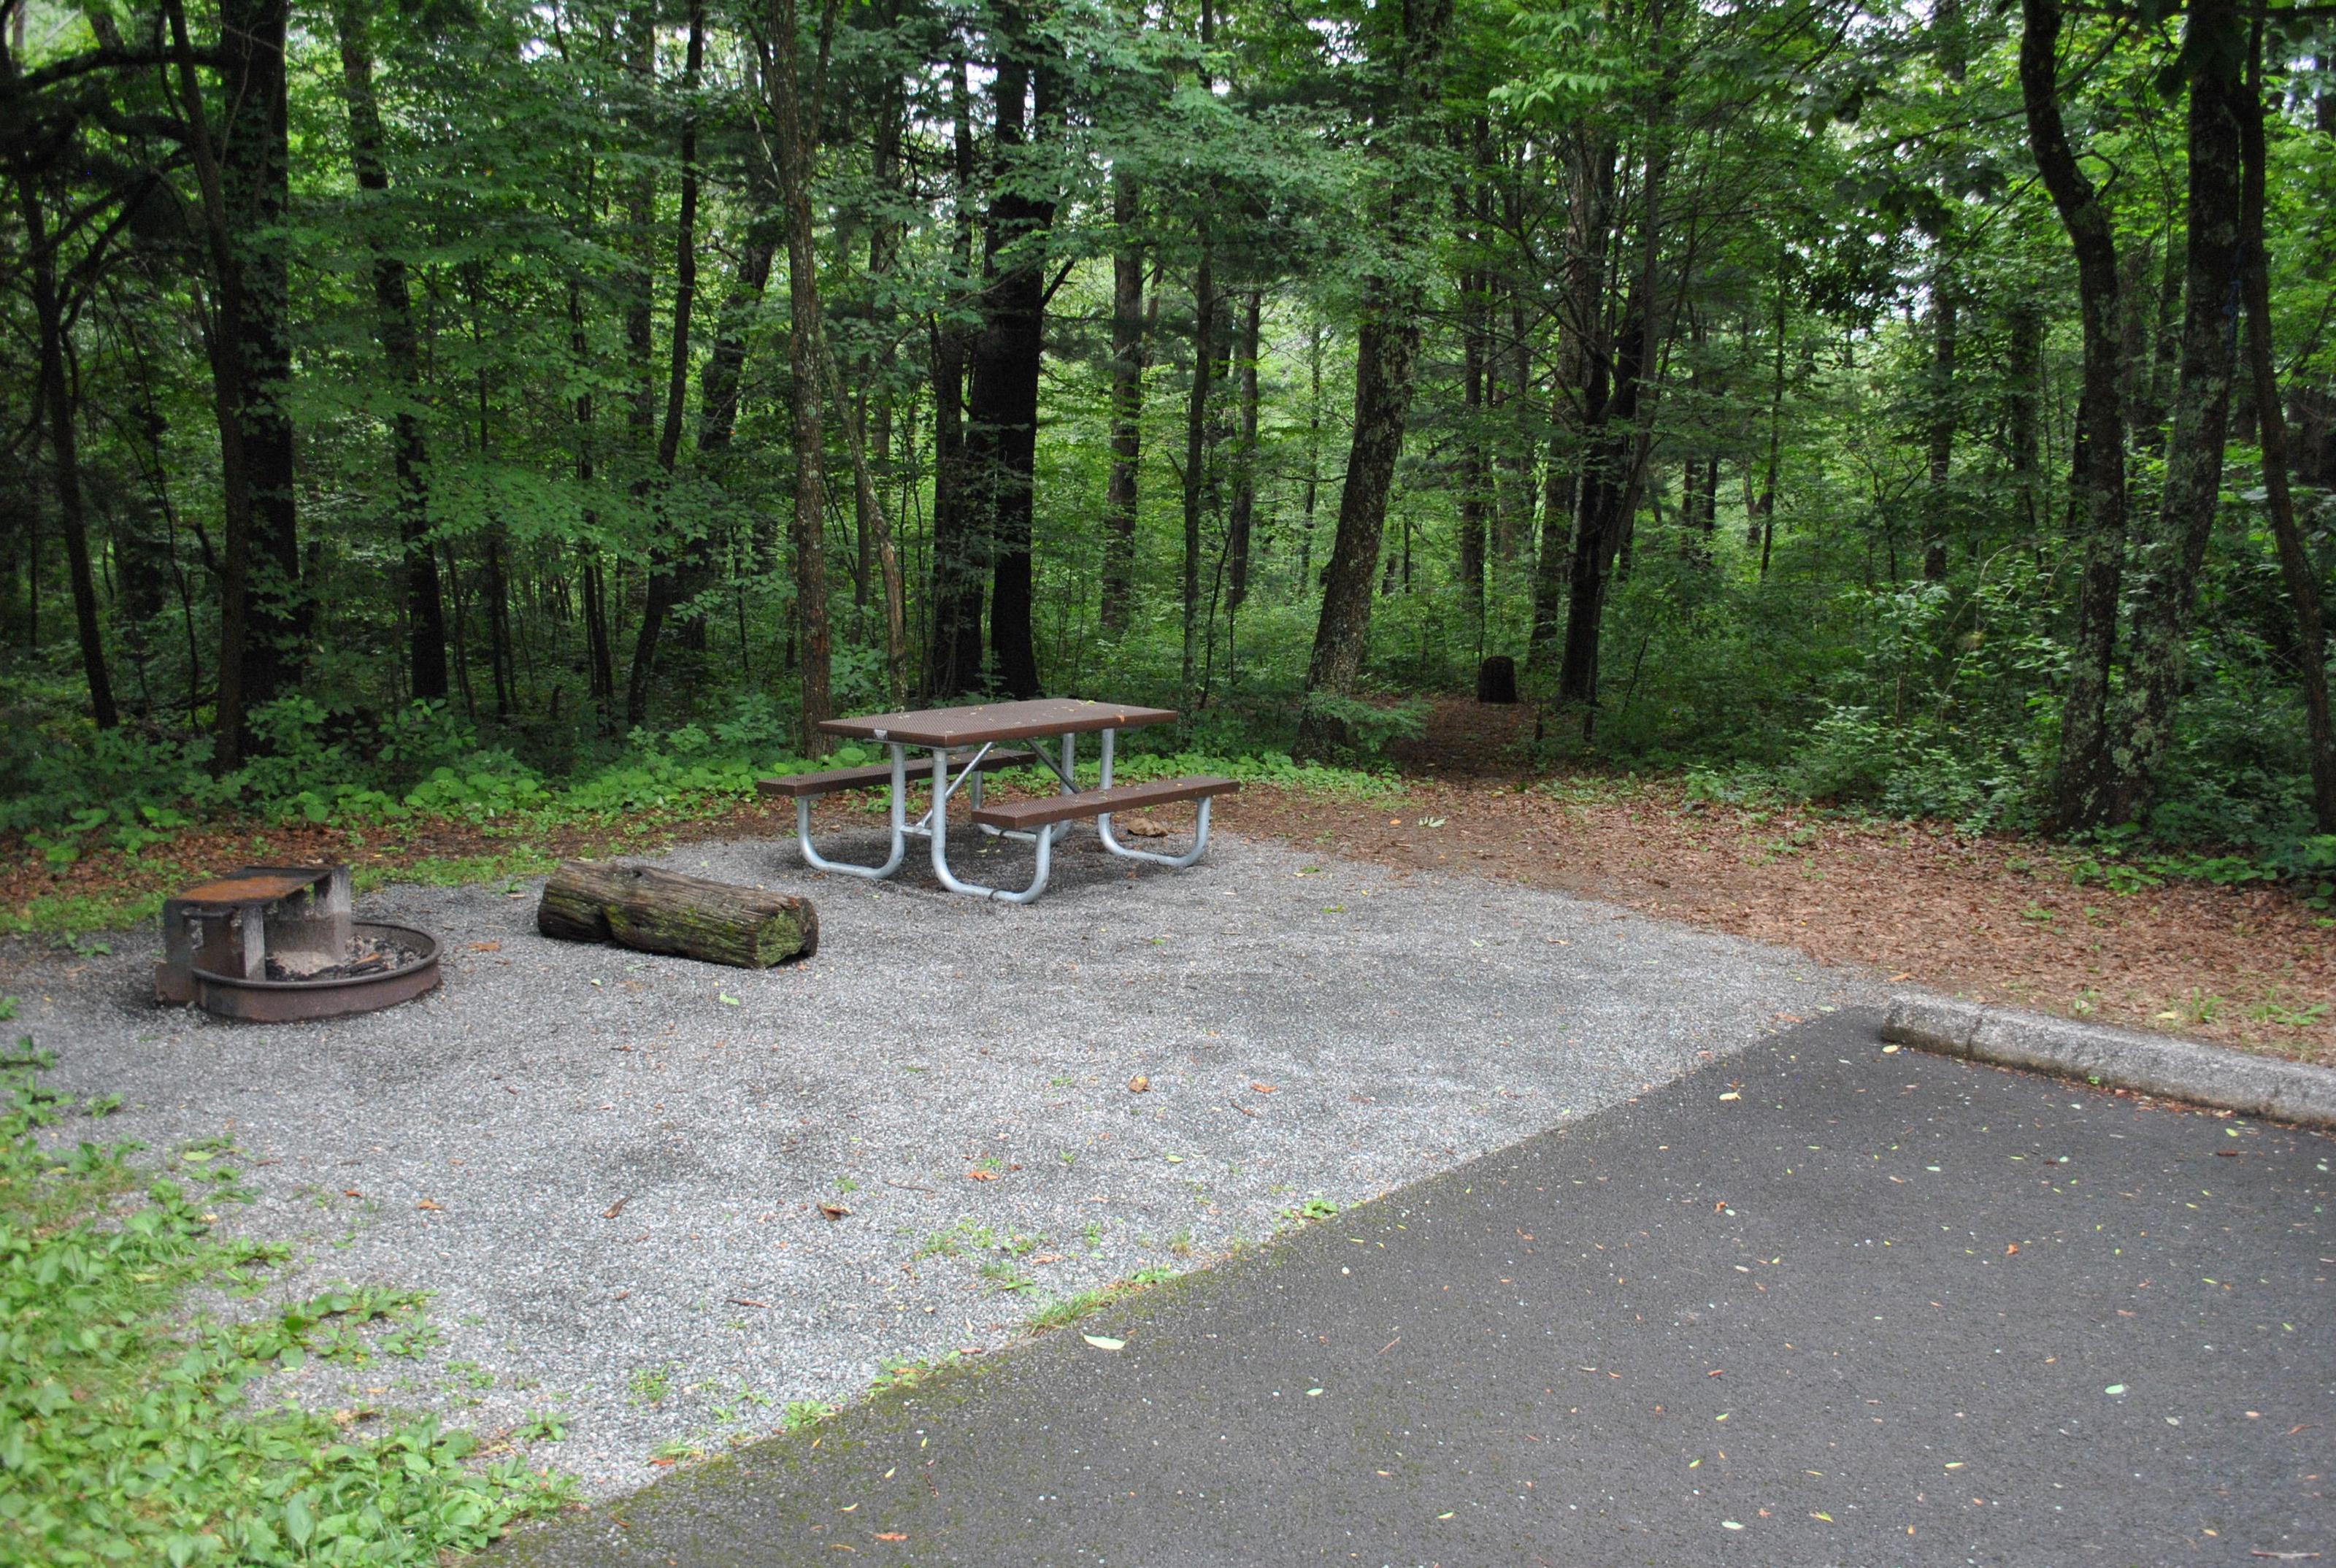 Mathews Arm Campground – Site A110